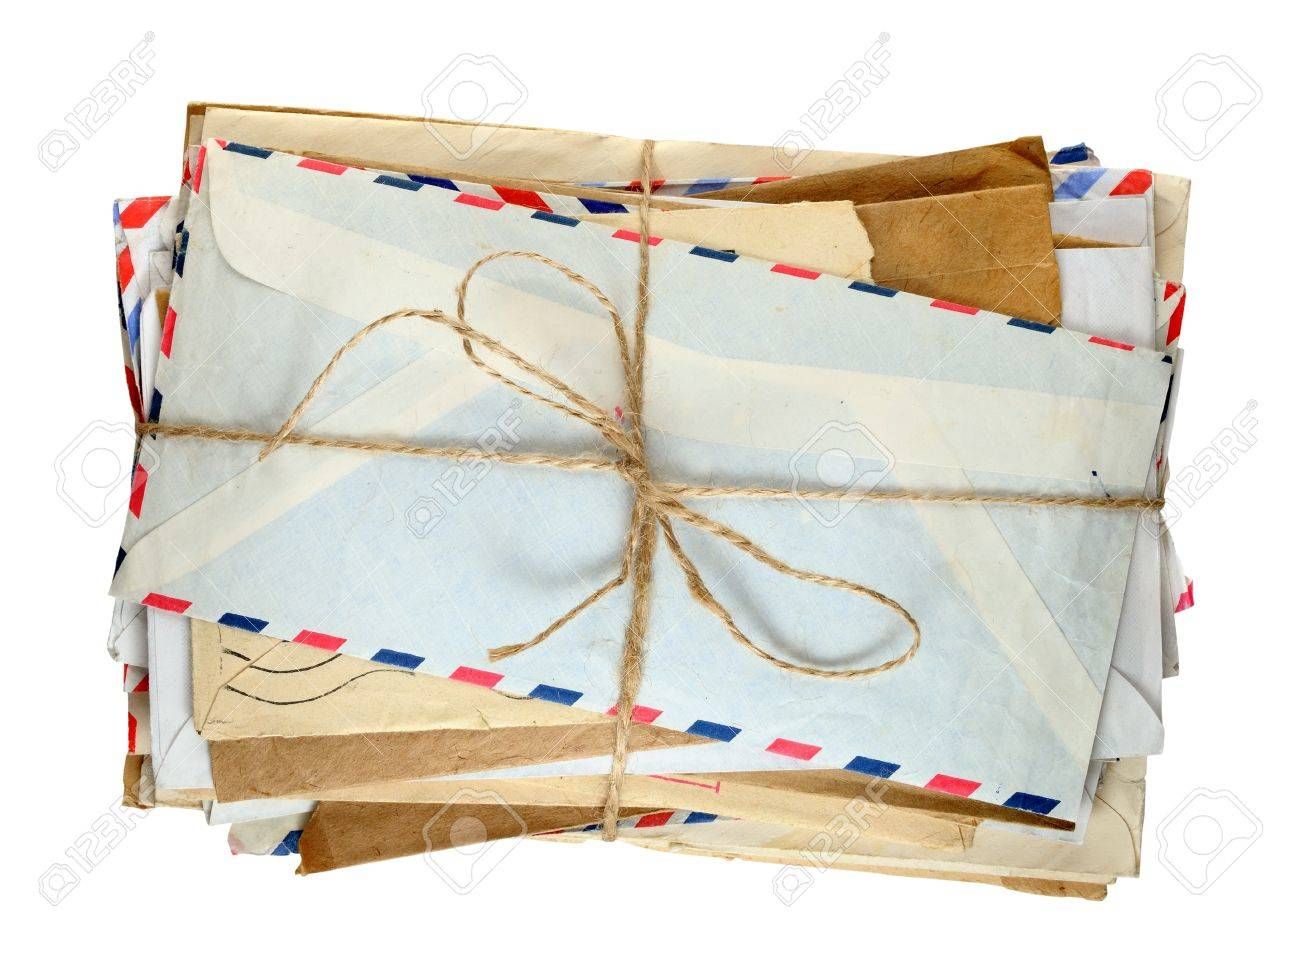 Pile of old envelopes isolated on white background - 18001363